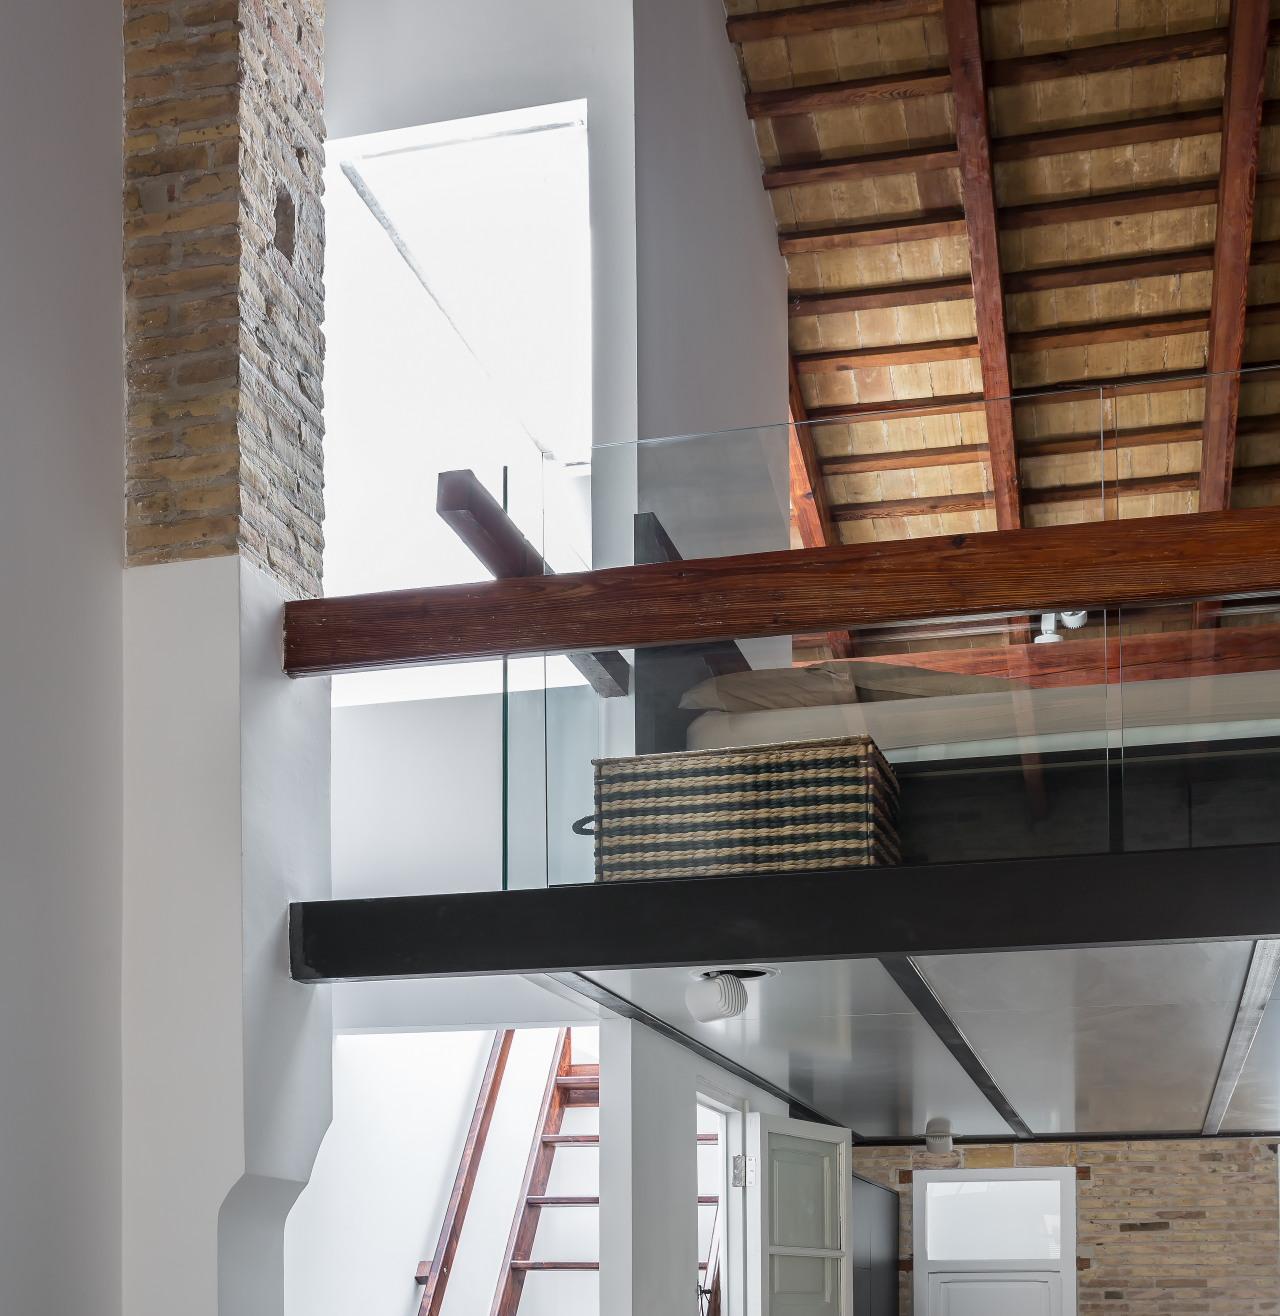 fotografia-arquitectura-valencia-german-cabo-ambau-cabanyal-18